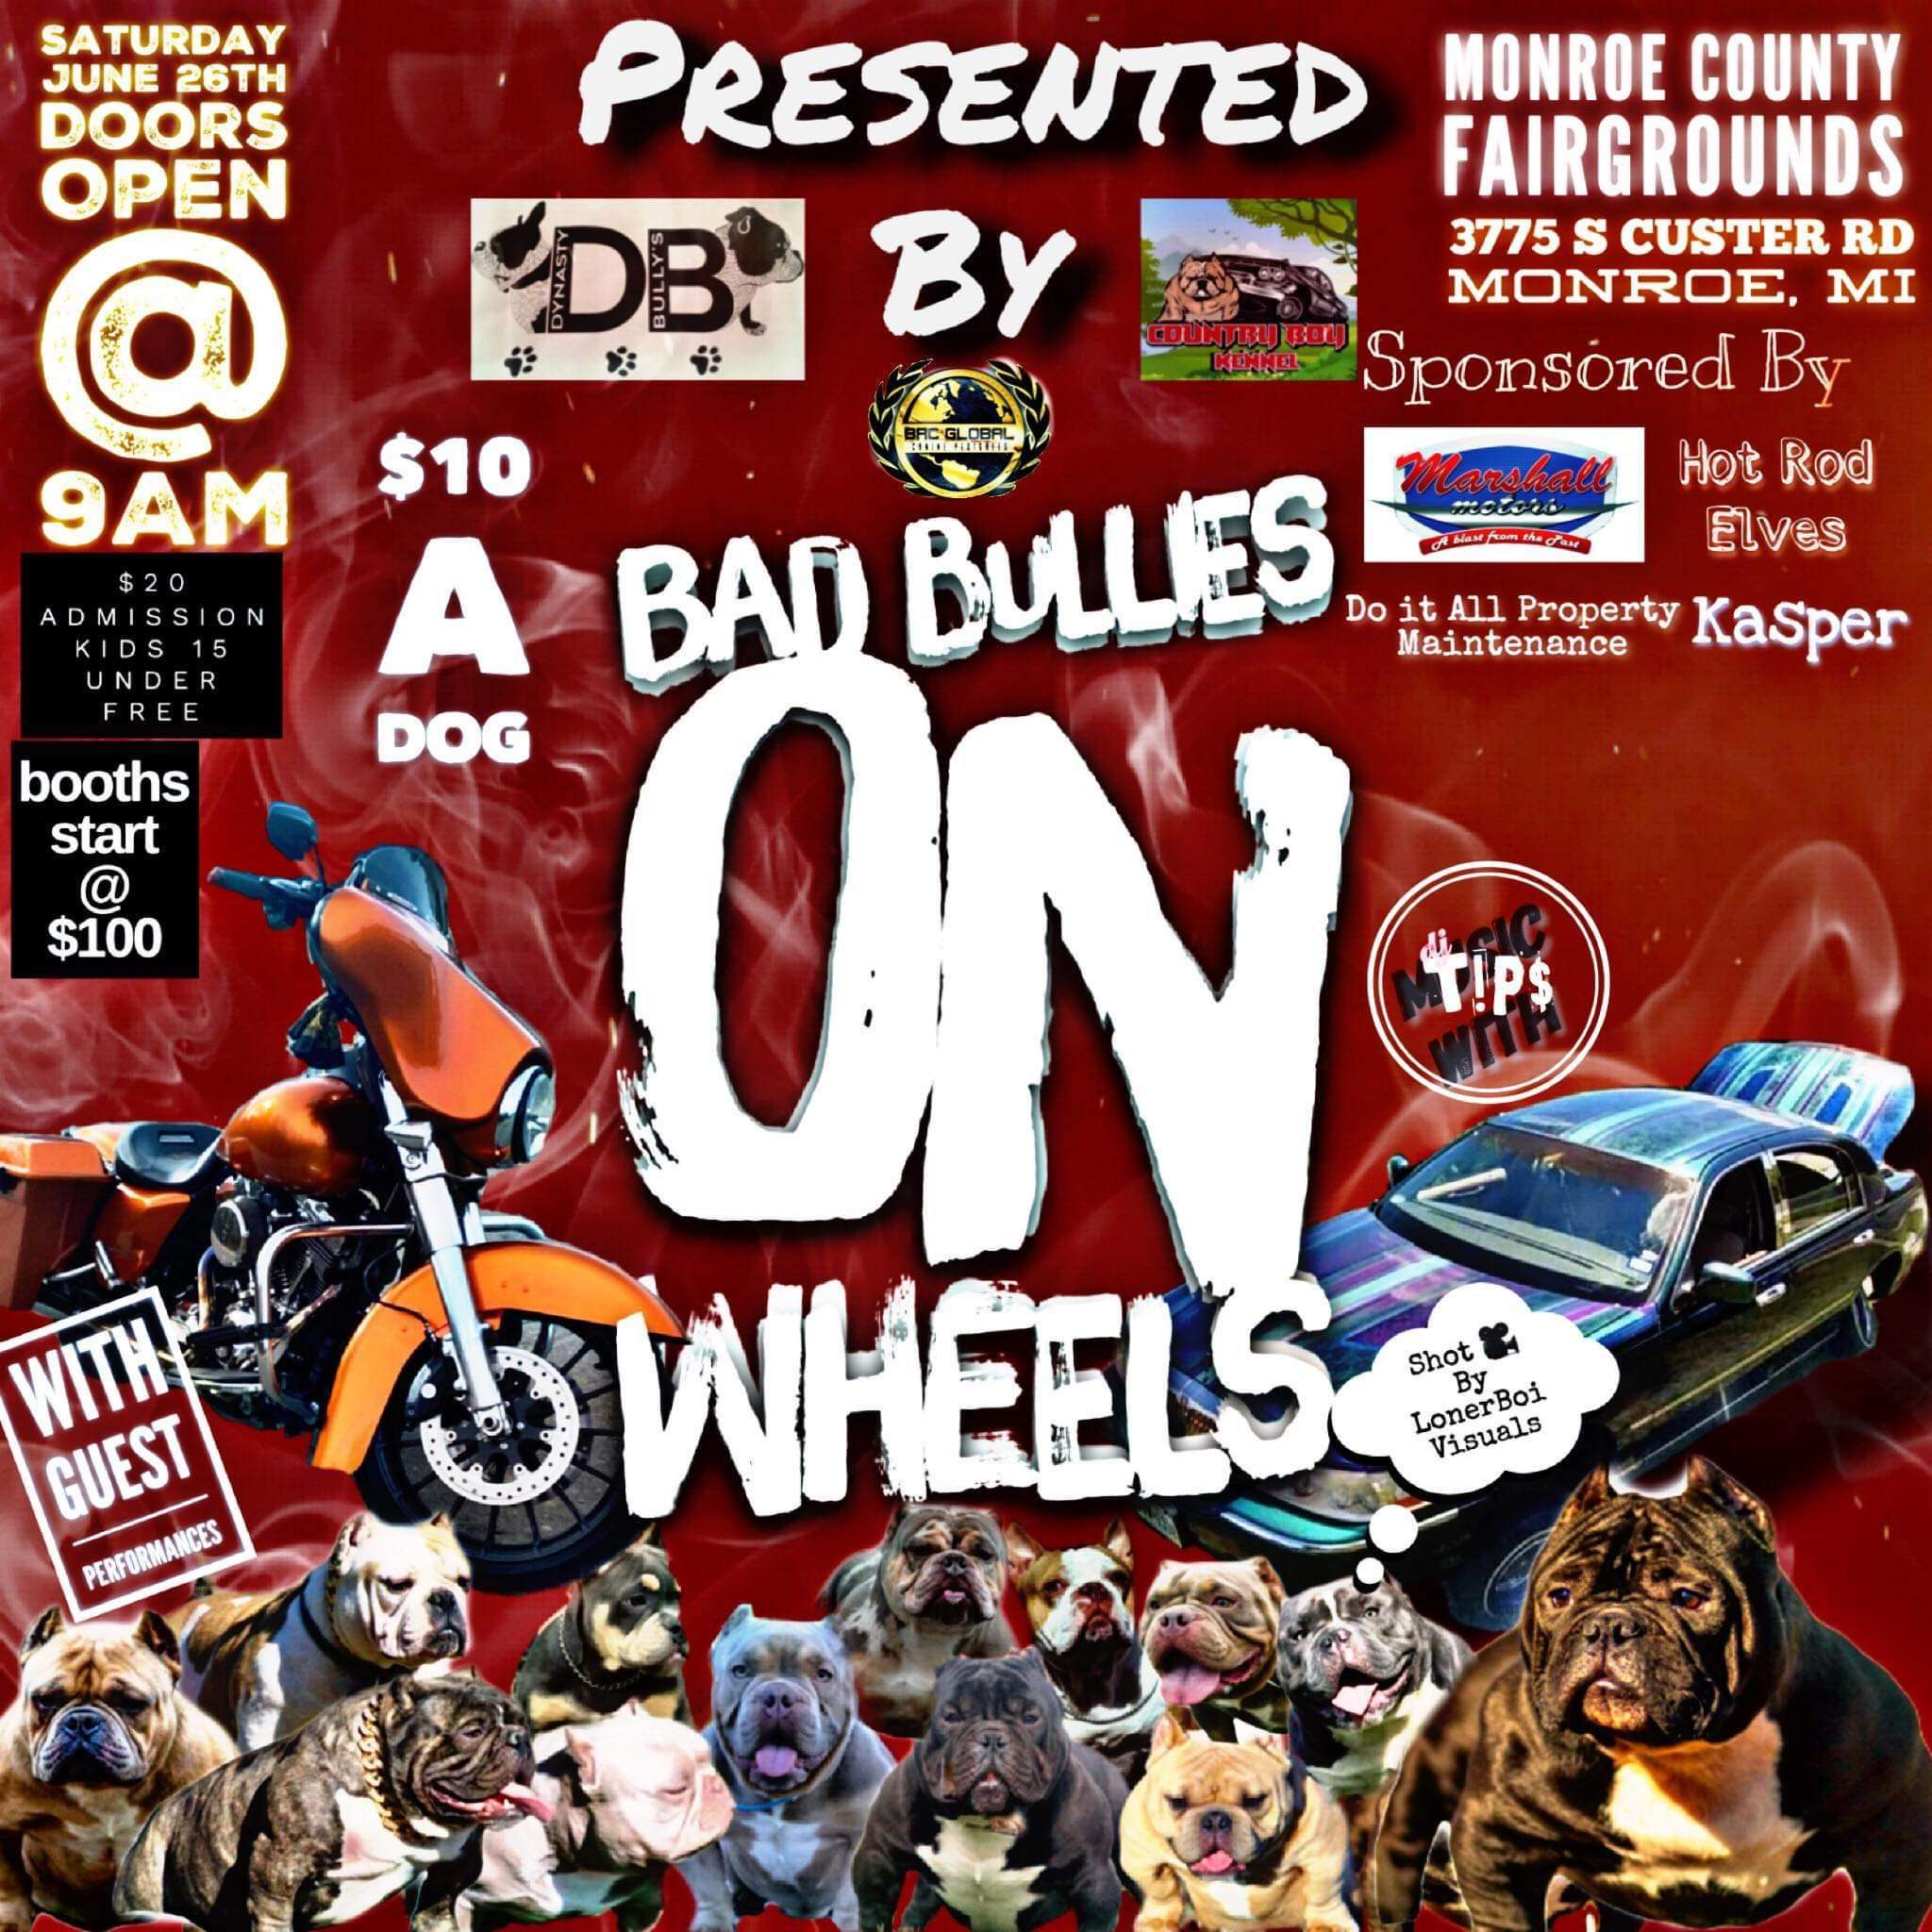 Bad Bullies On Wheels – June 26th – Monroe County Fairgrounds